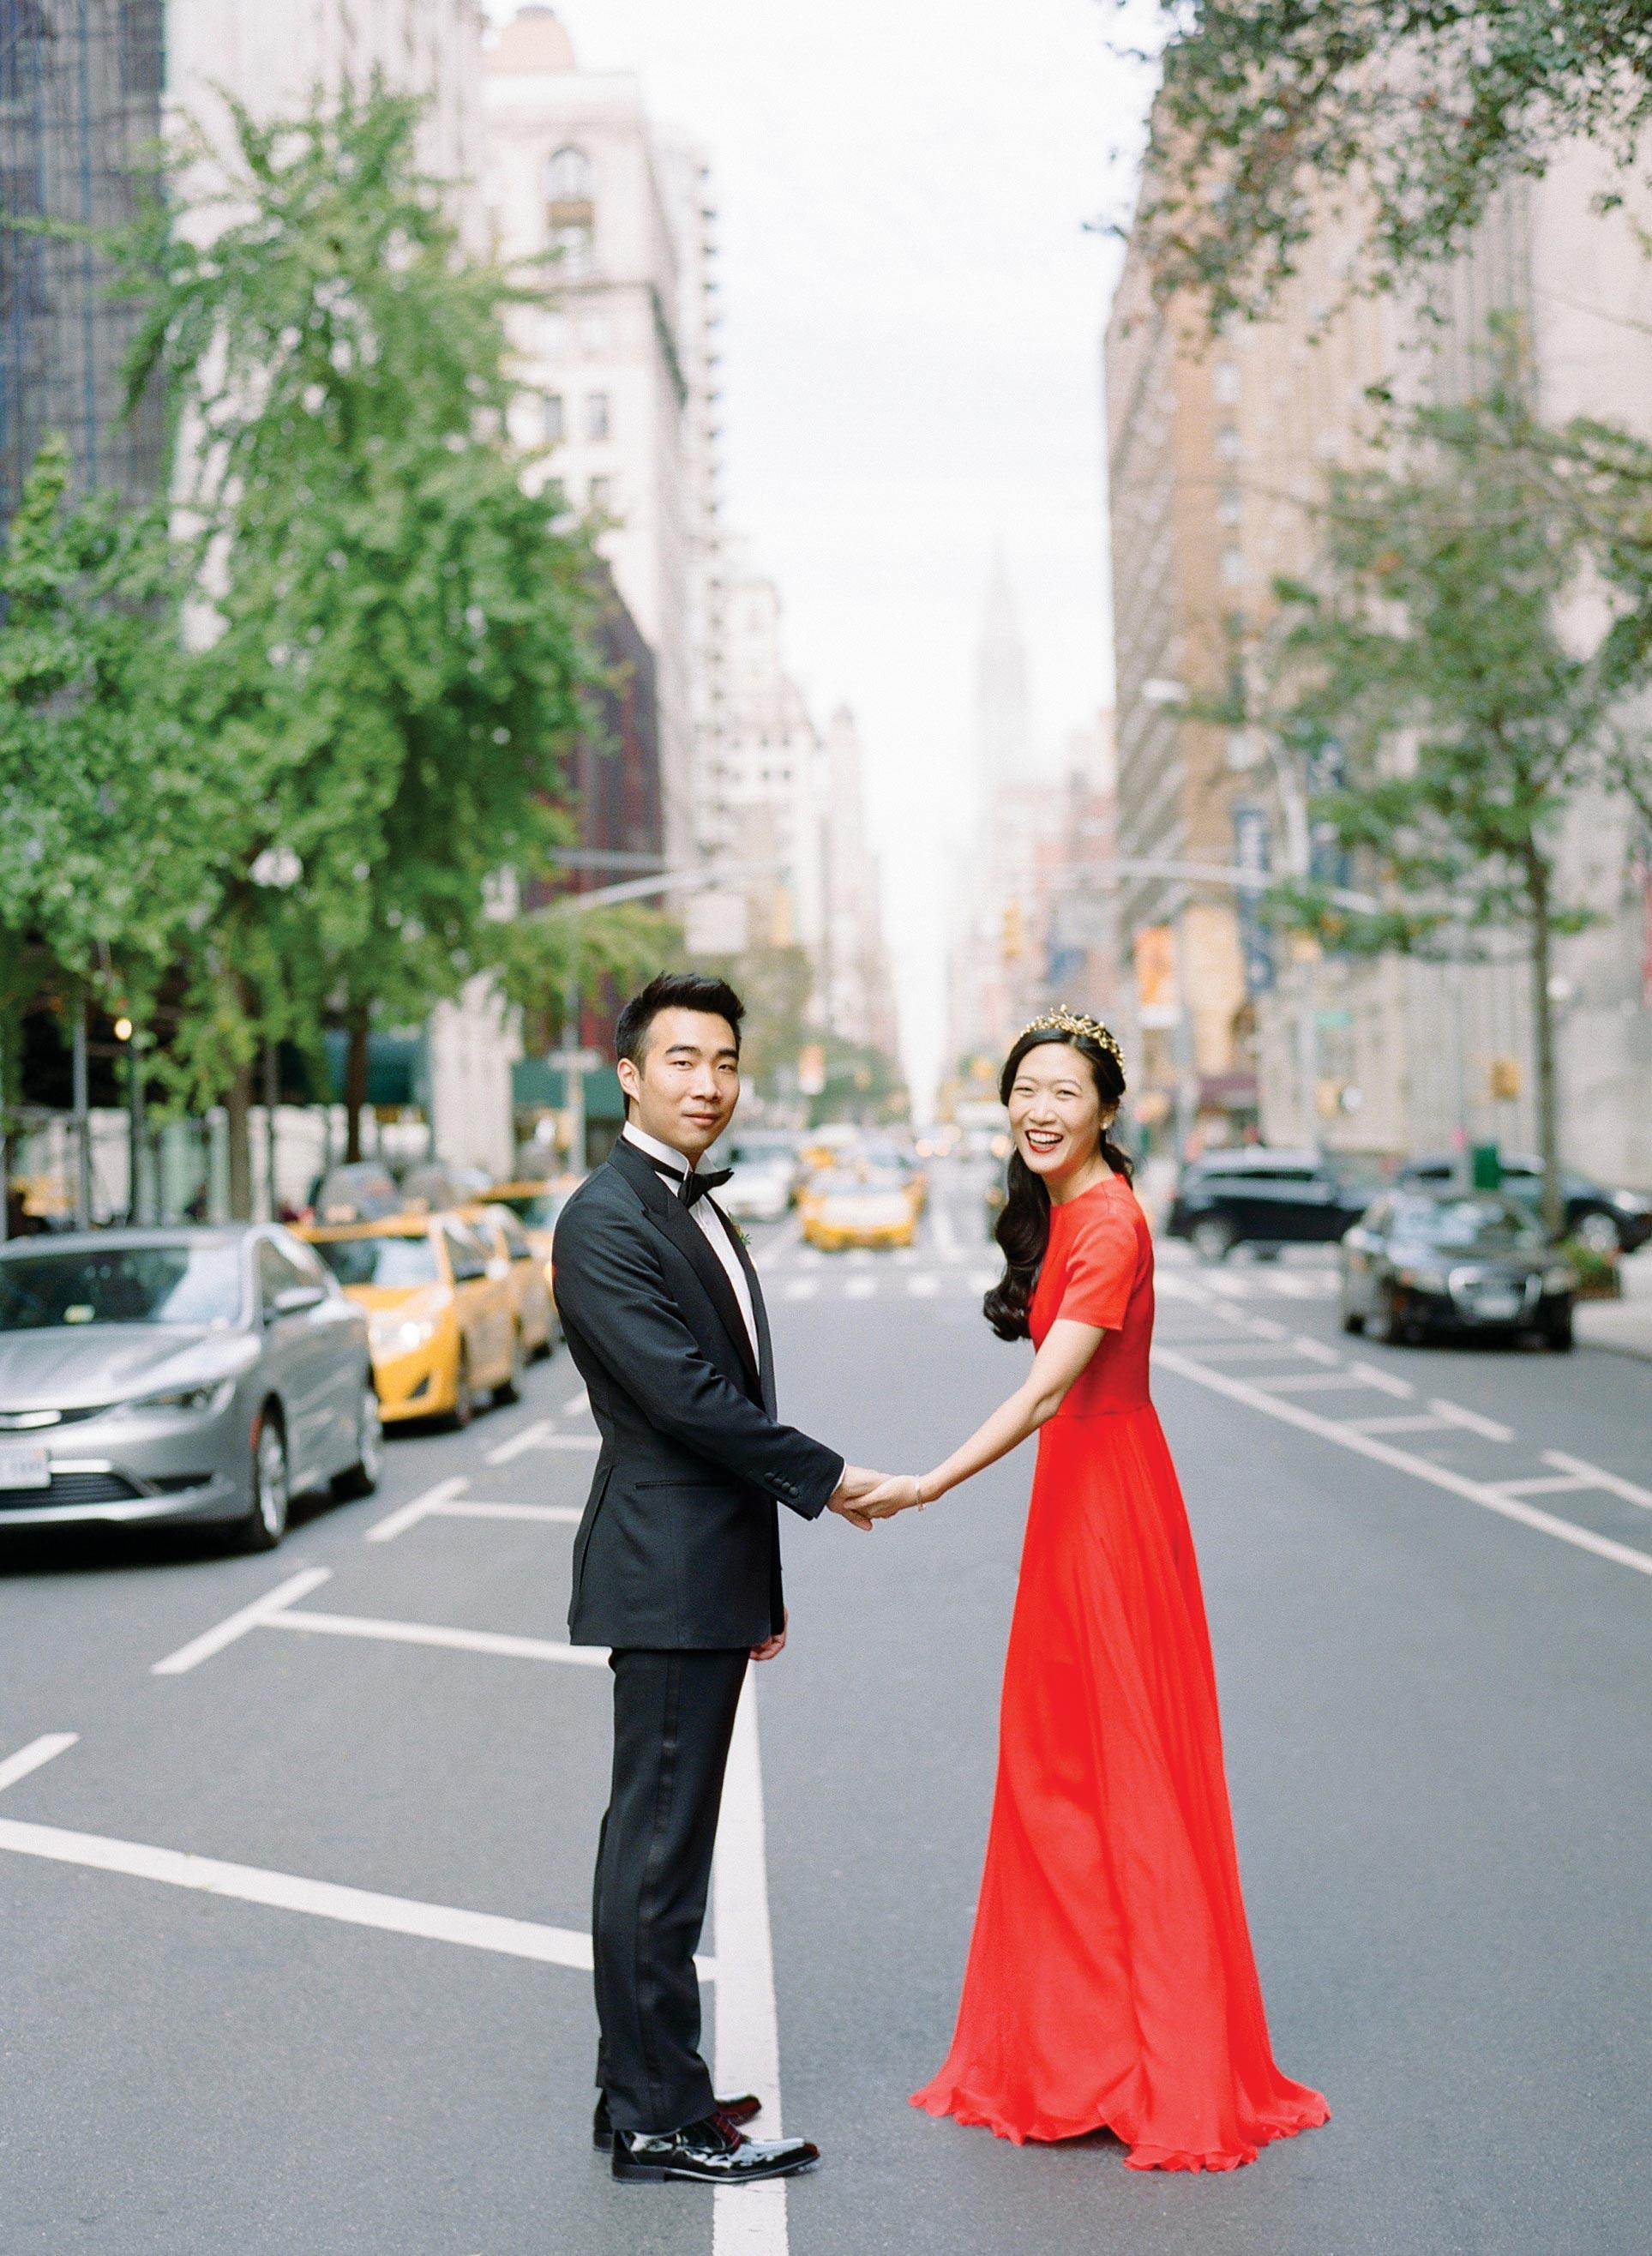 glara matthew wedding couple portrait city street